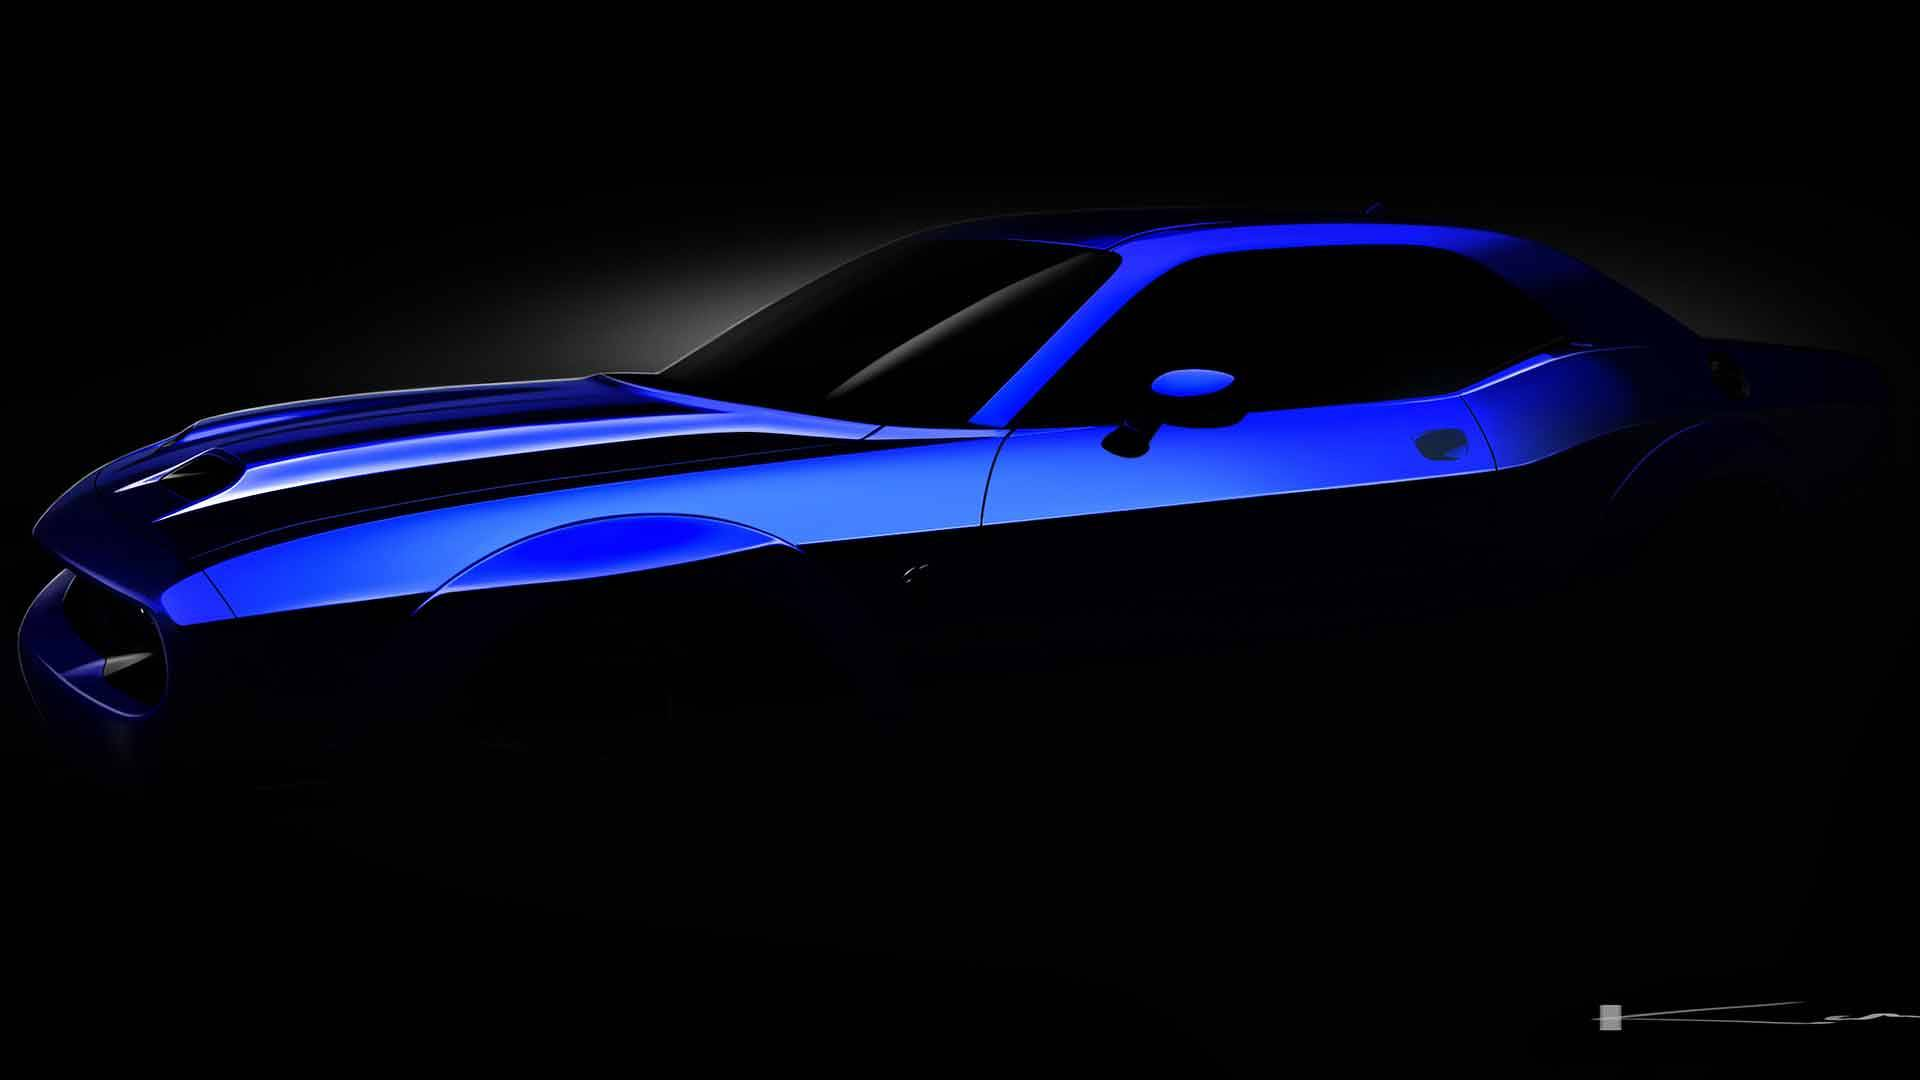 Srt Hellcat Charger >> 2019 Dodge Challenger SRT Hellcat Previewed Ahead of Summer Reveal - autoevolution